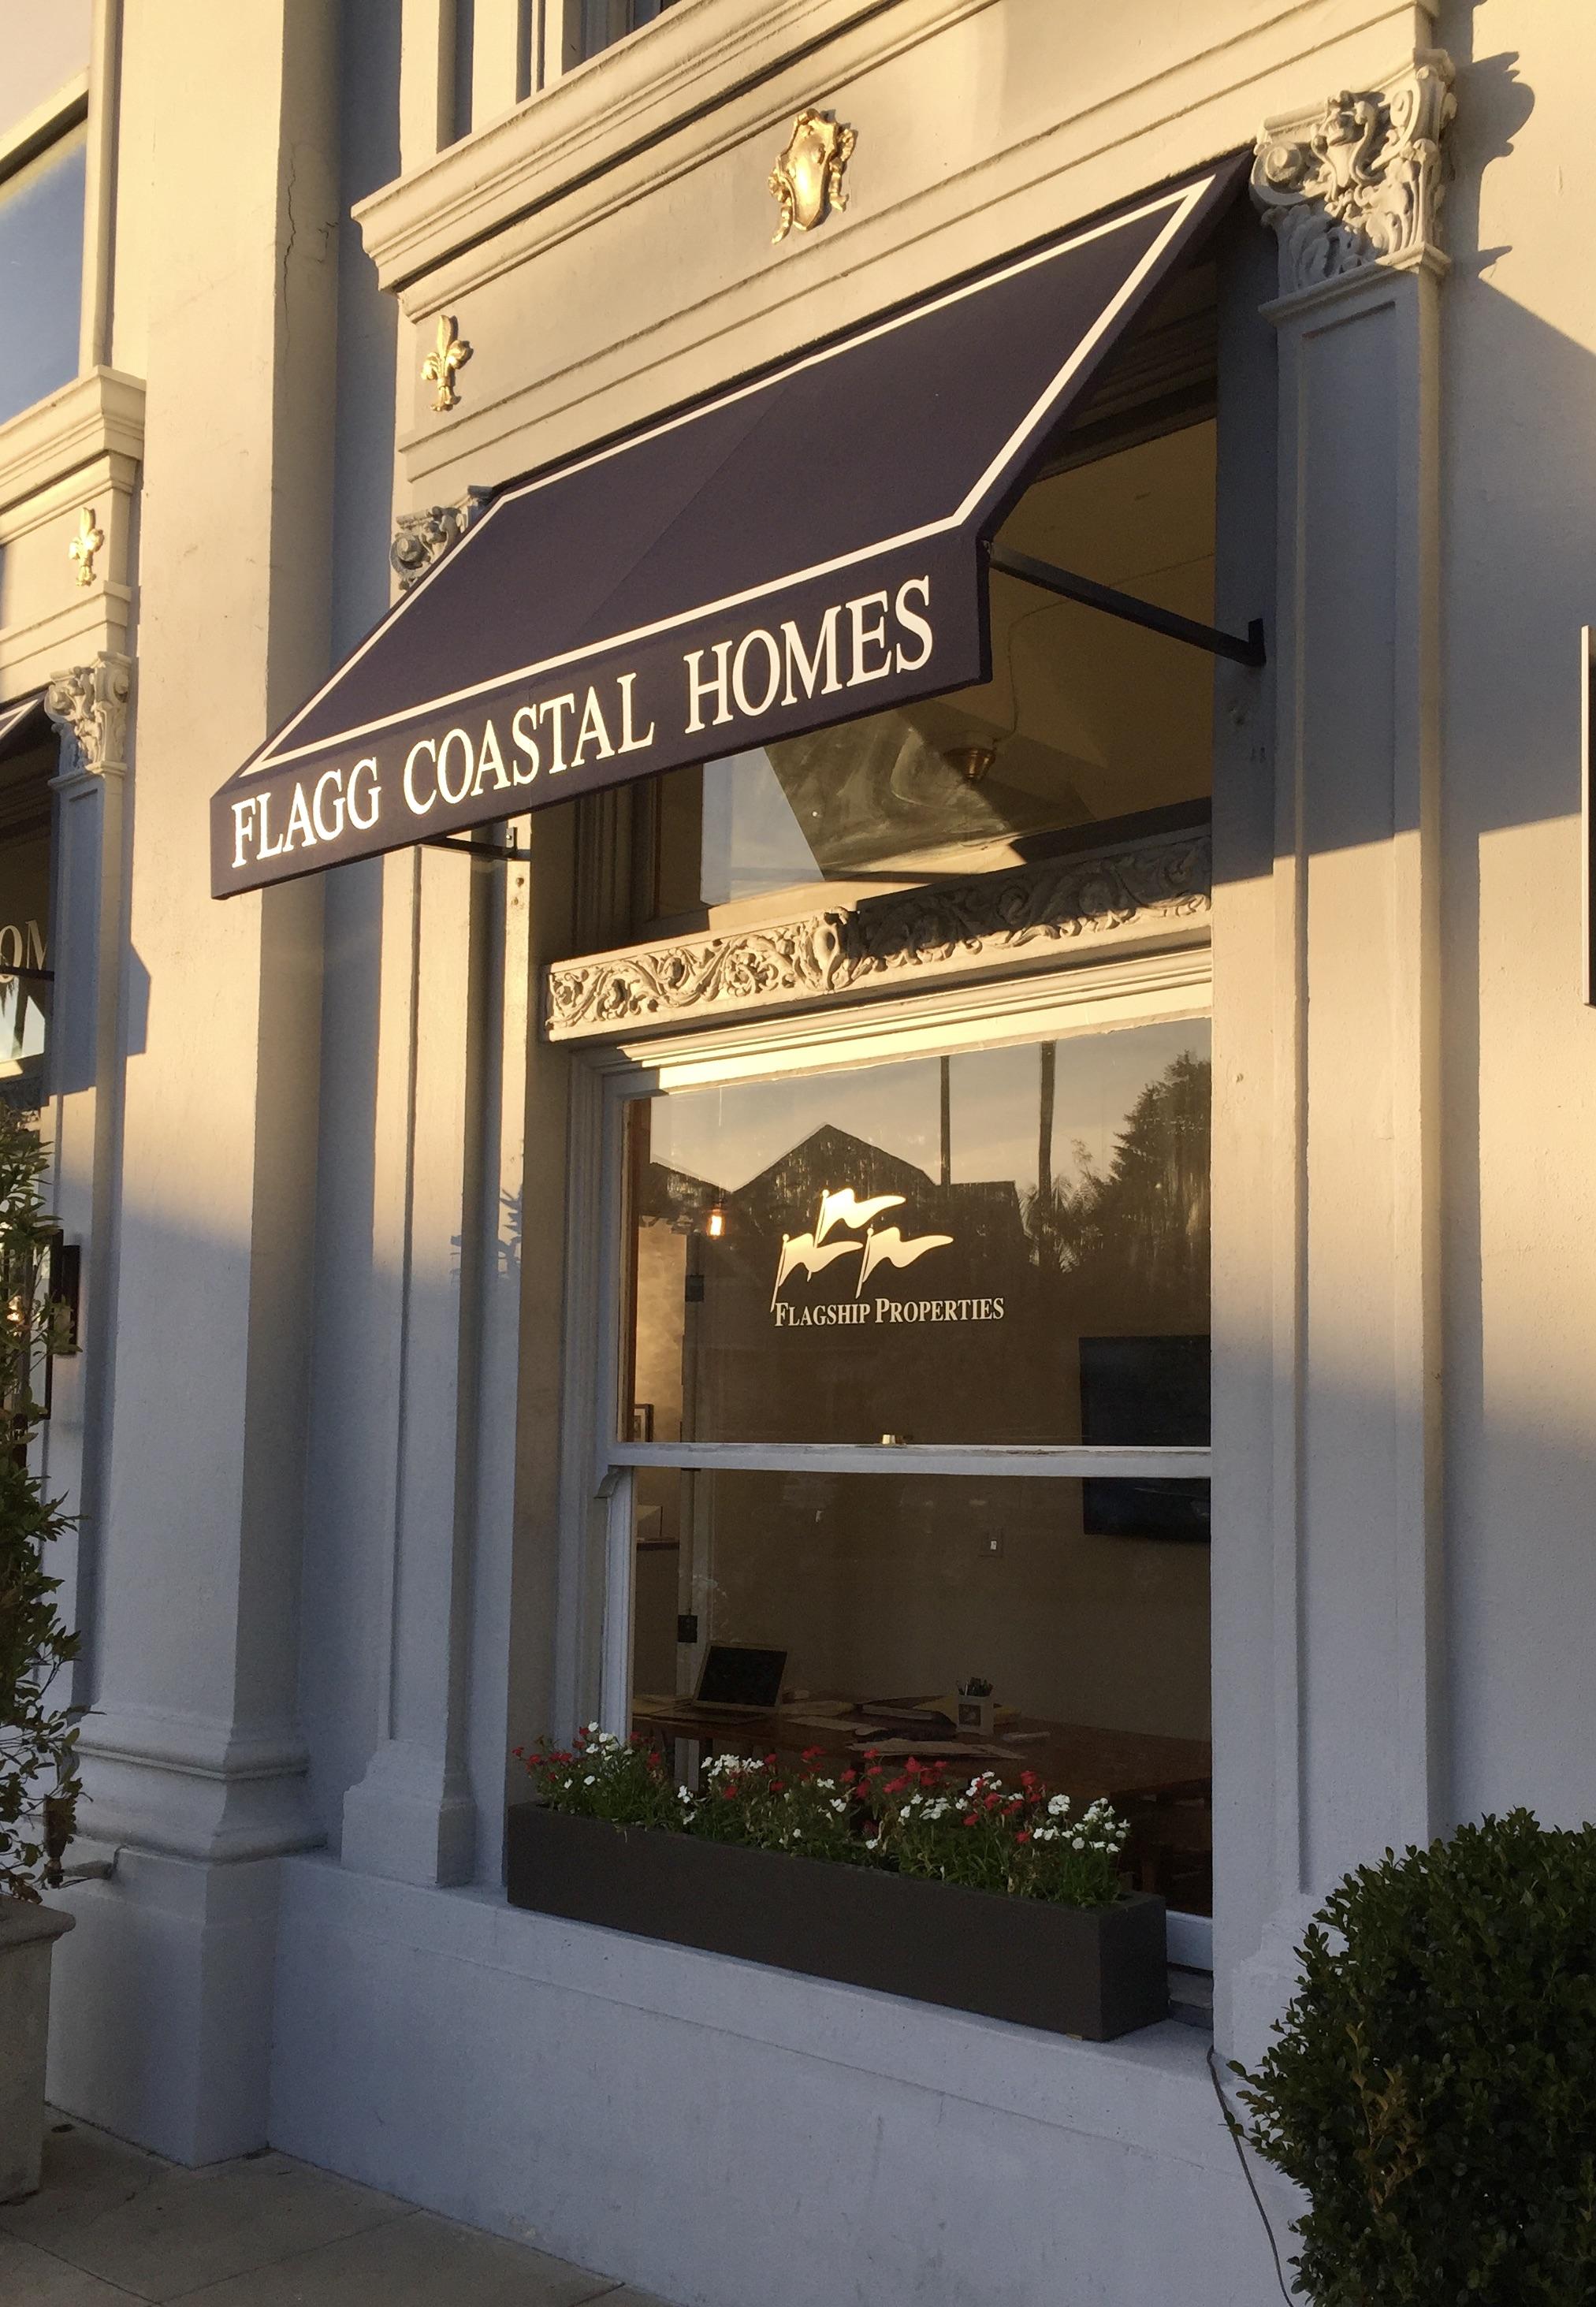 Flagg Coastal Homes logo